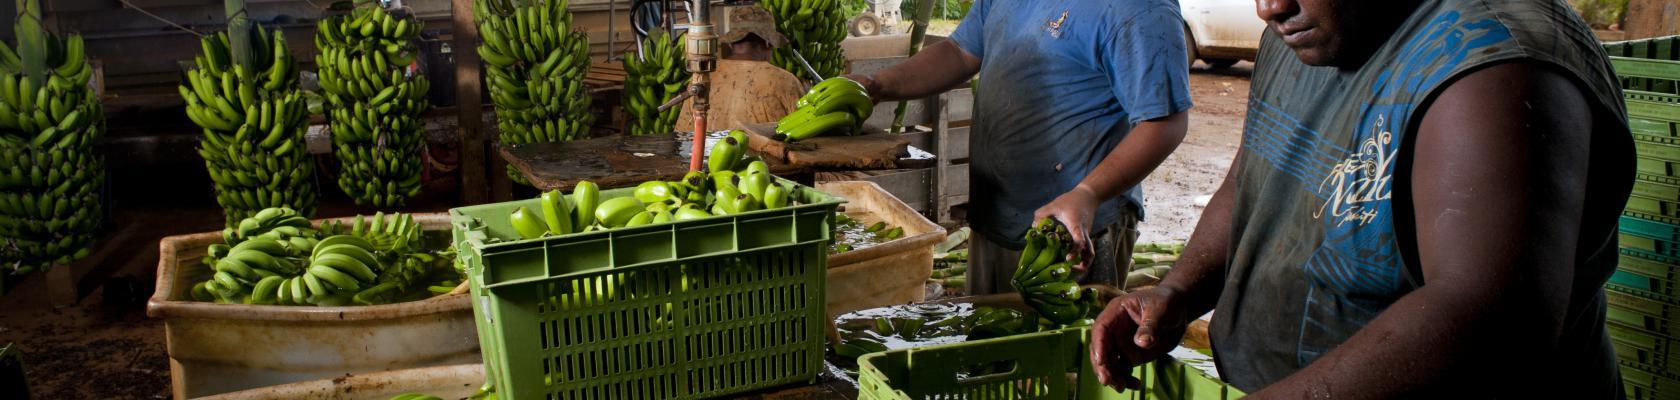 Tropical fruits, bananas, men, Le Chélard, New-Caledonia